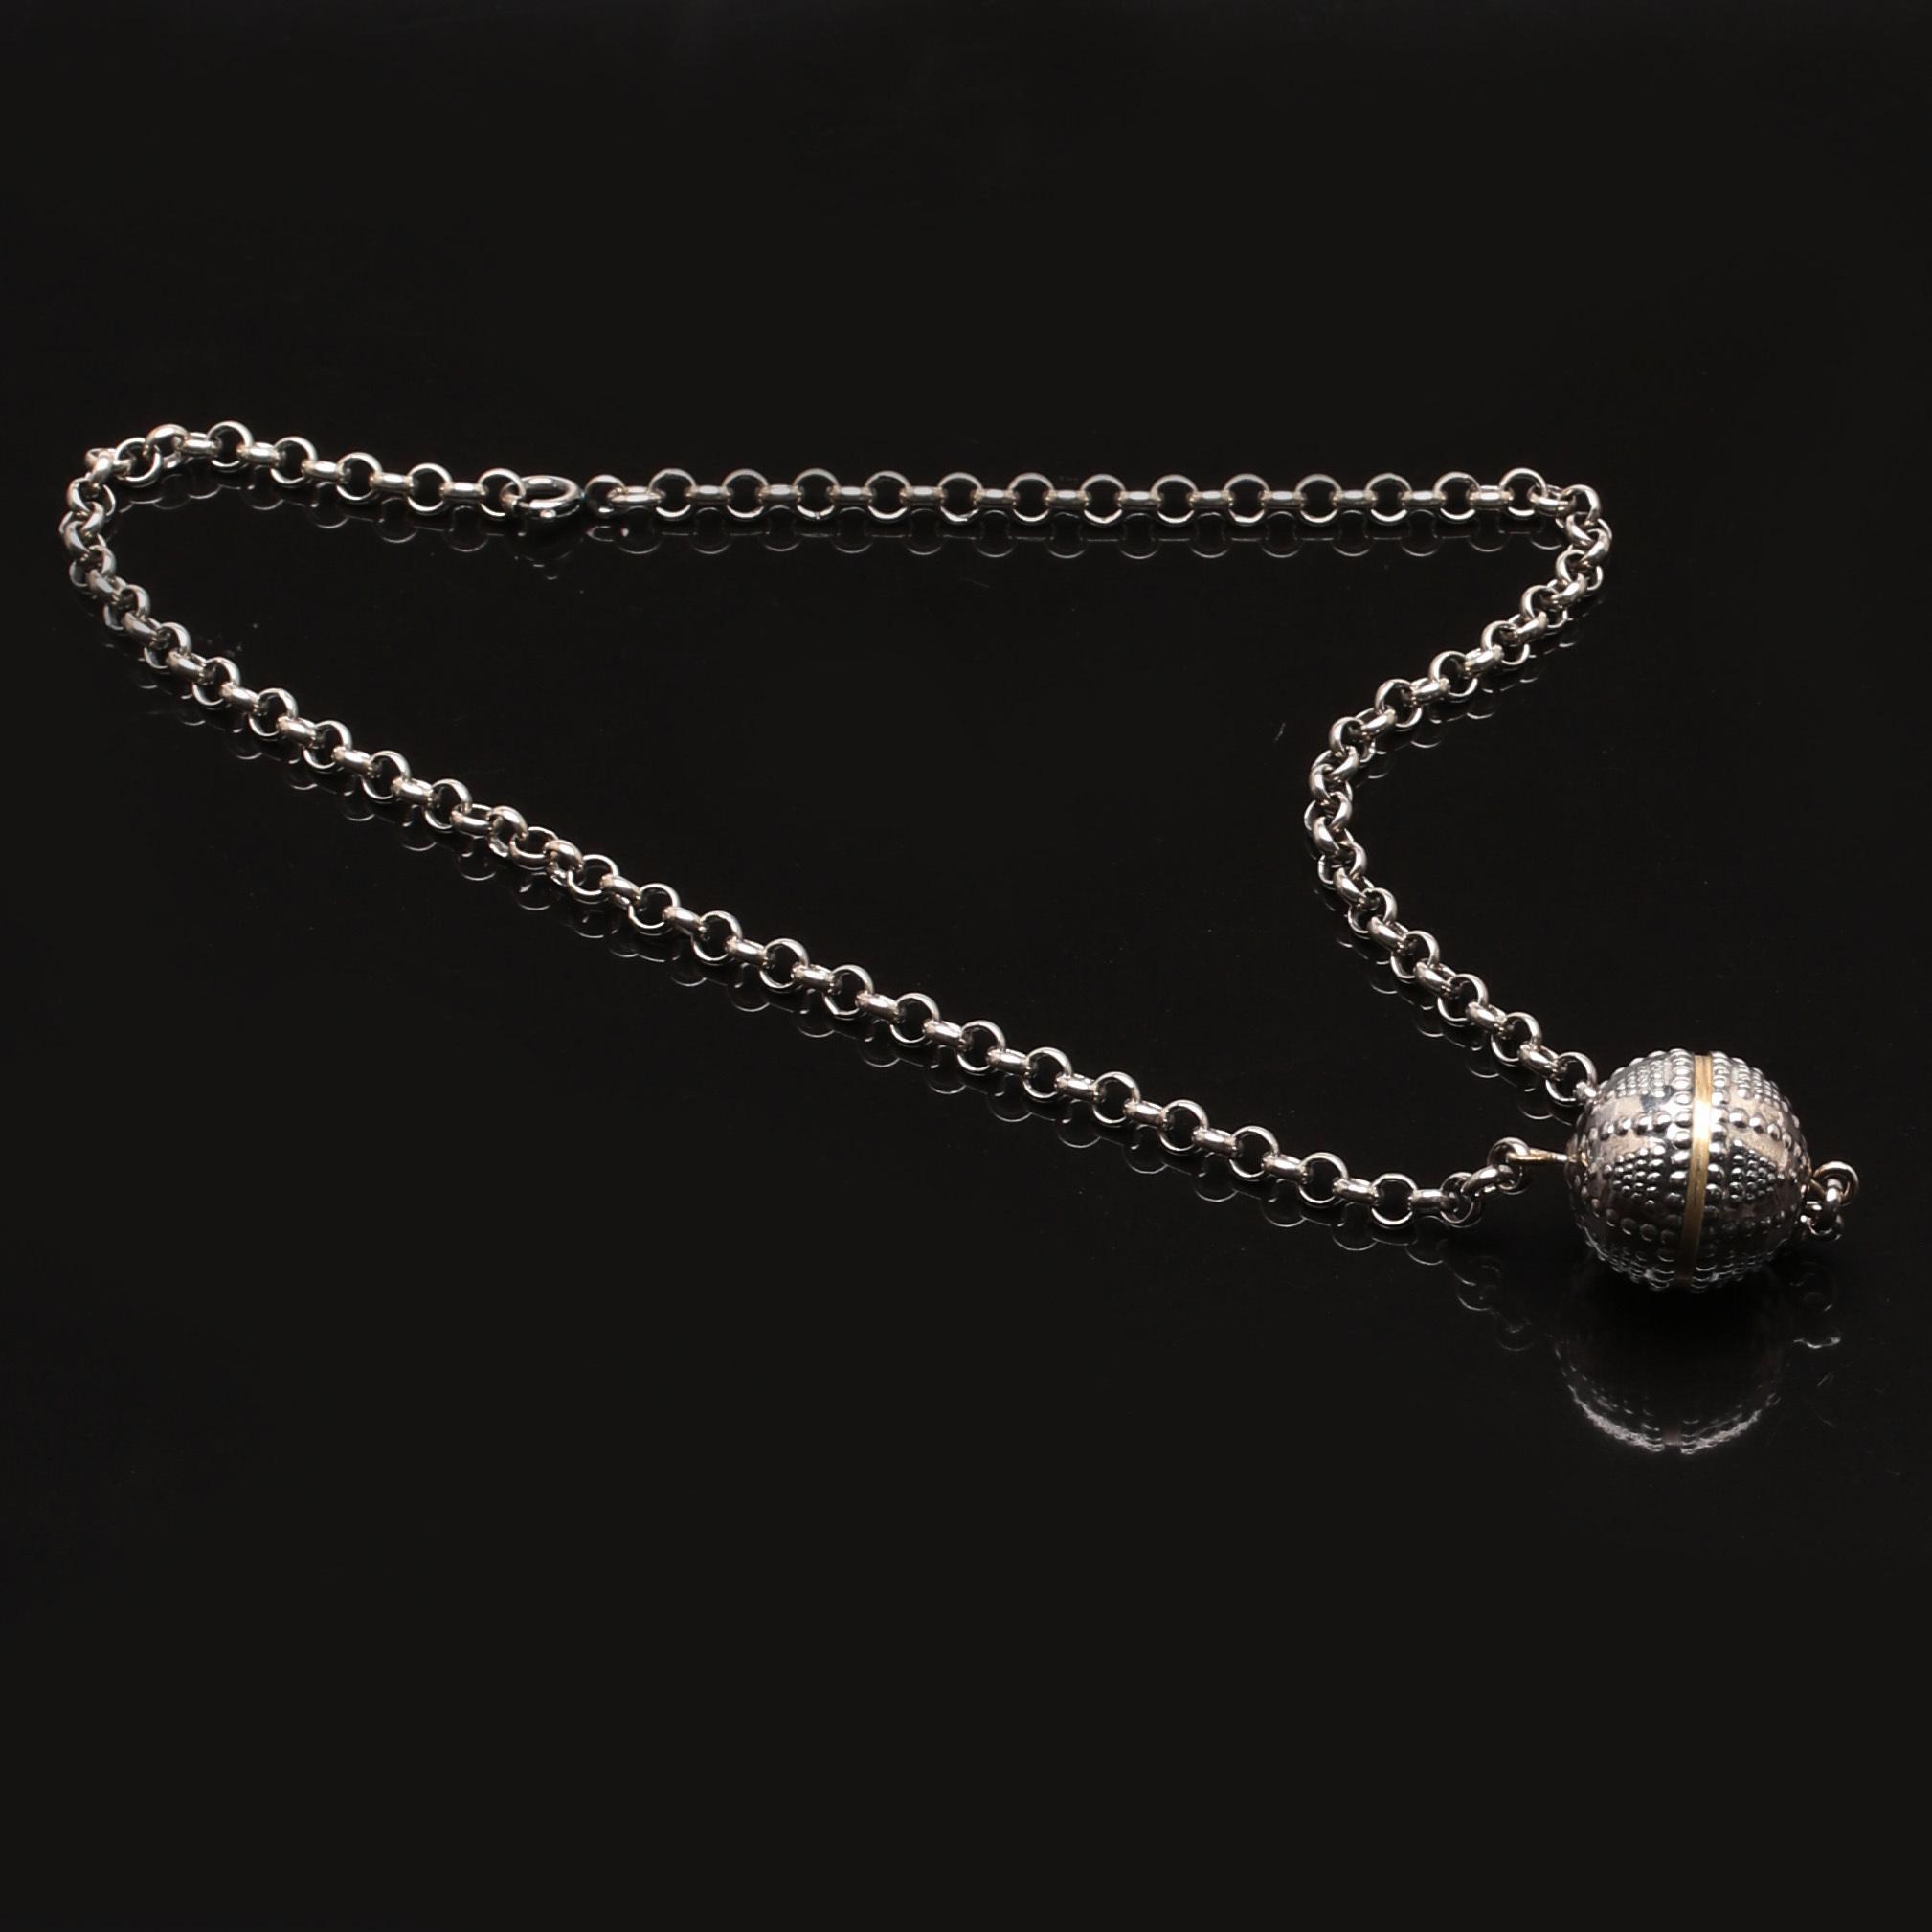 HALSBAND med HÄNGE, silver, Kalevala Jewelry, Finland